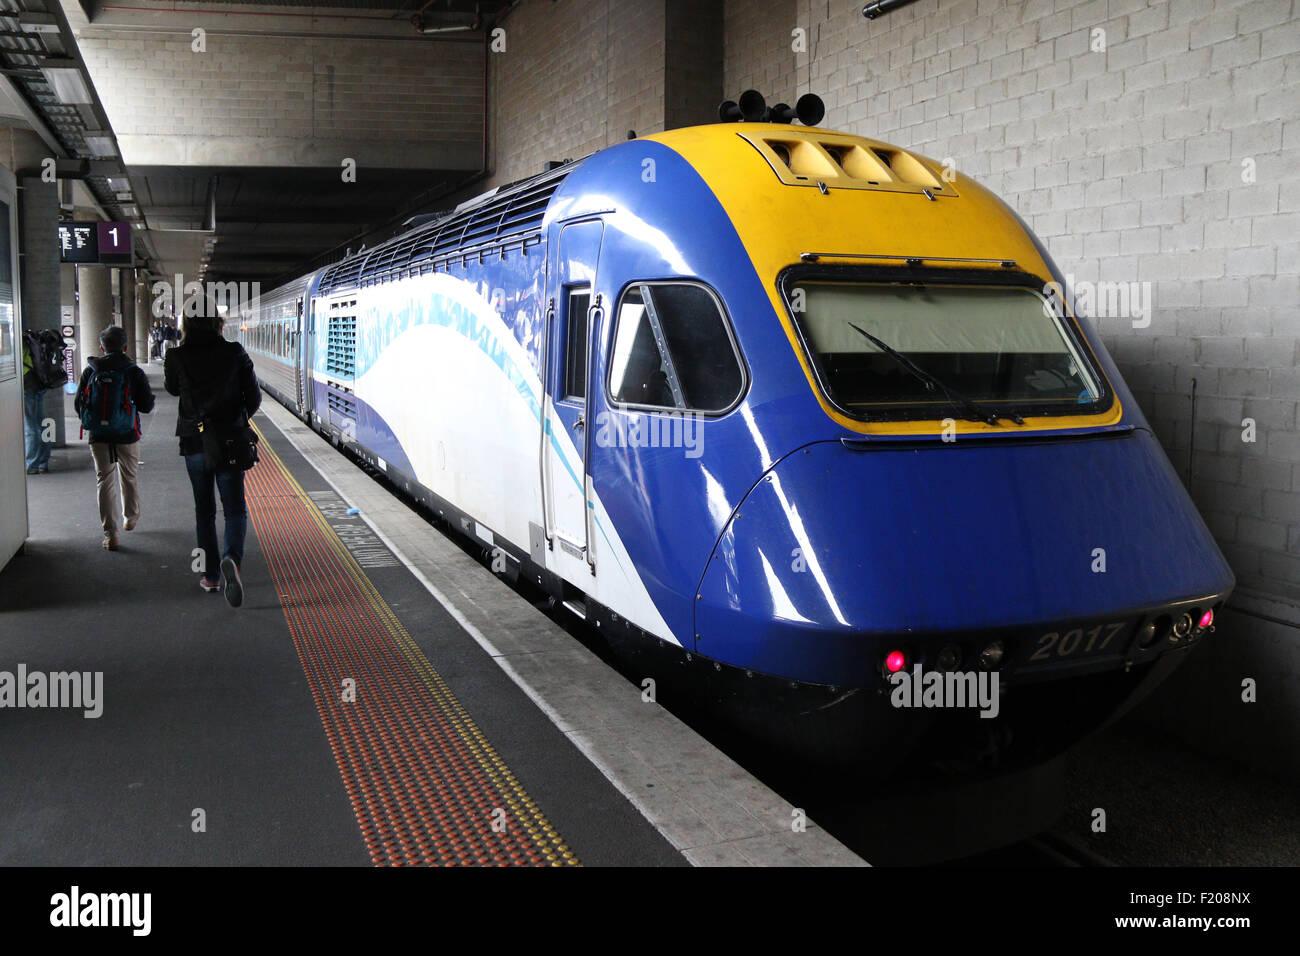 Sydney Train Stock Photos & Sydney Train Stock Images - Alamy